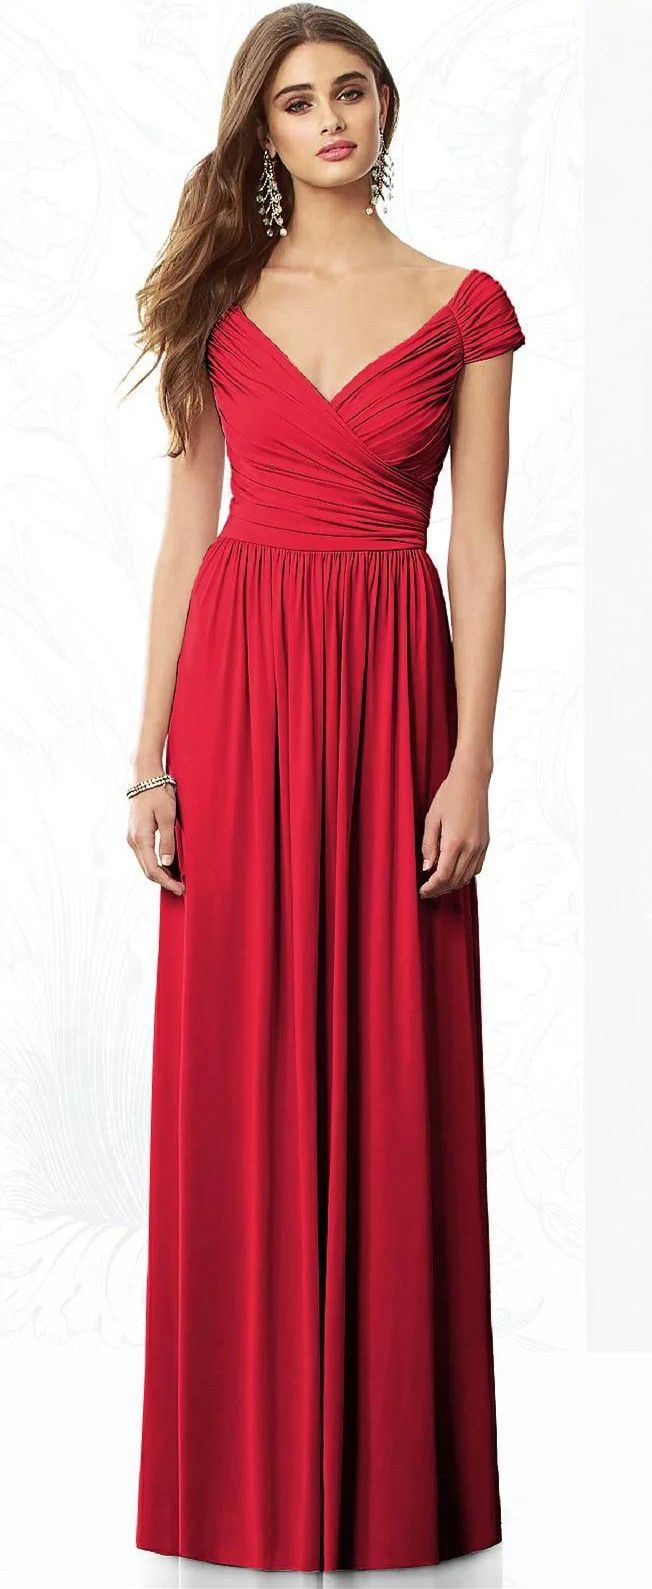 359 best bridesmaid dresses images on pinterest long dresses 20 most popular red bridesmaid dresses ombrellifo Choice Image